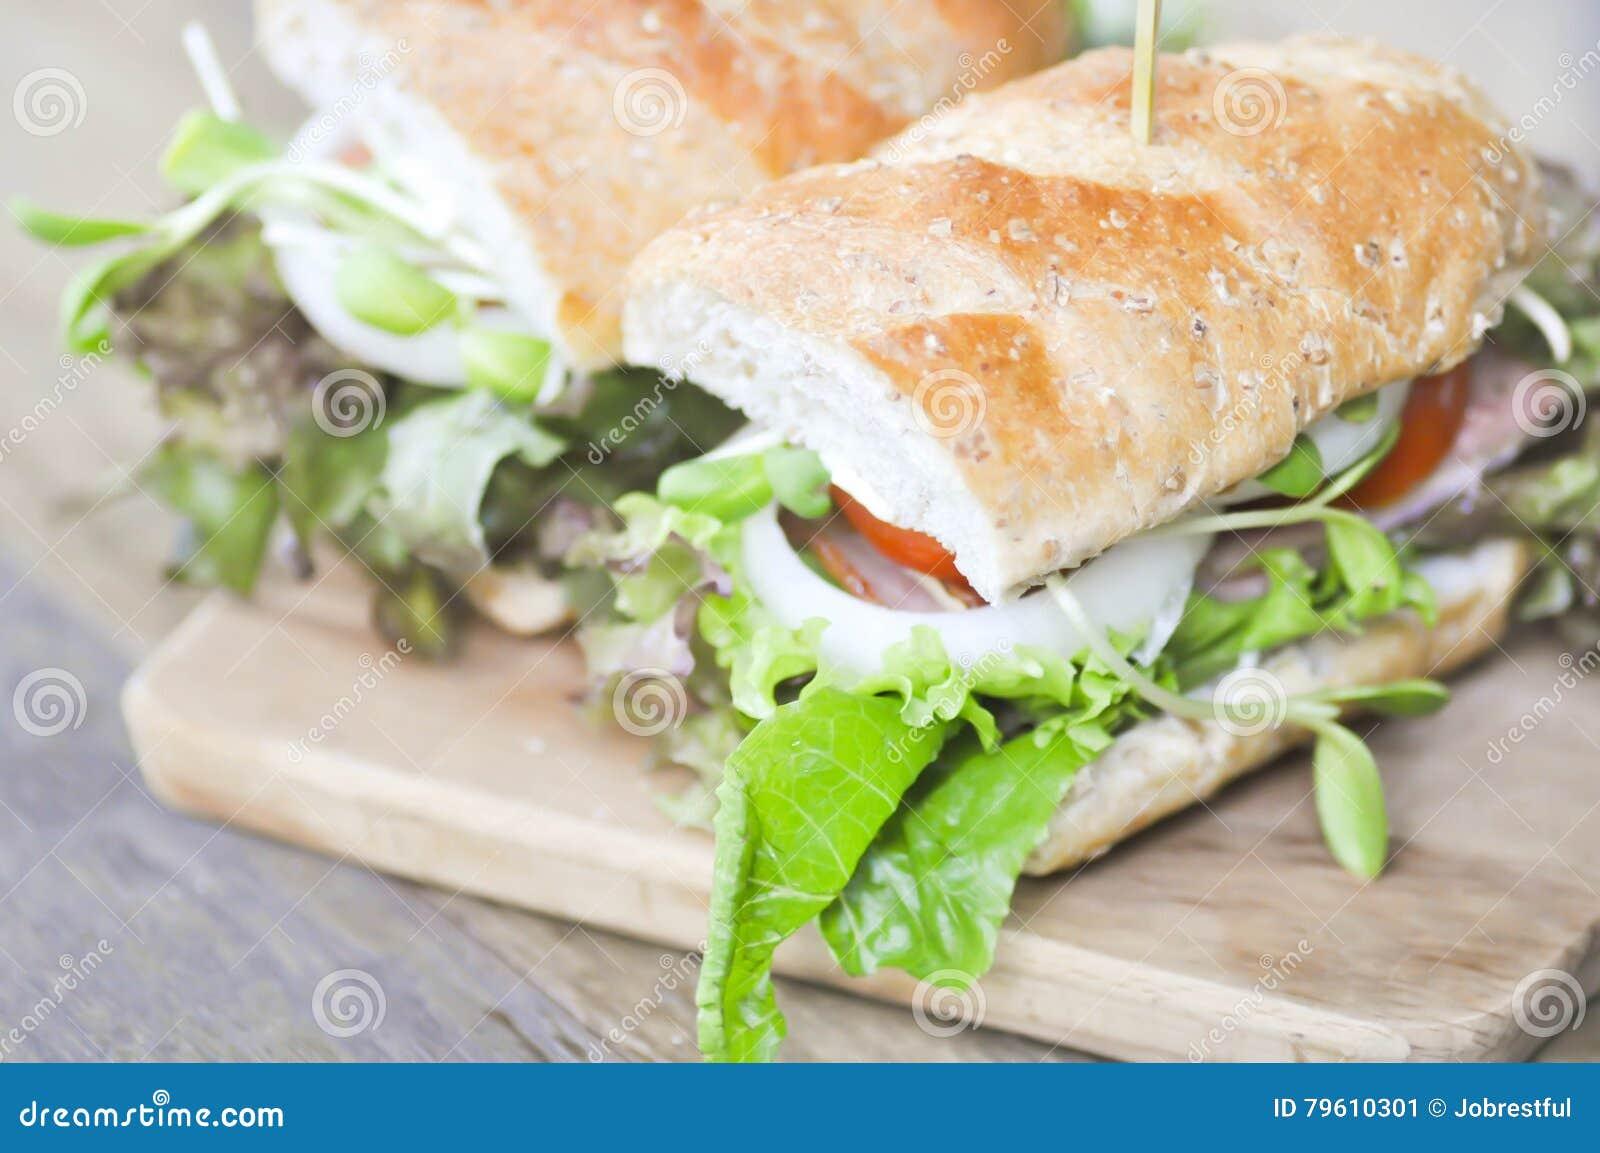 Sanduíche do Baguette com presunto, tomate, e alface